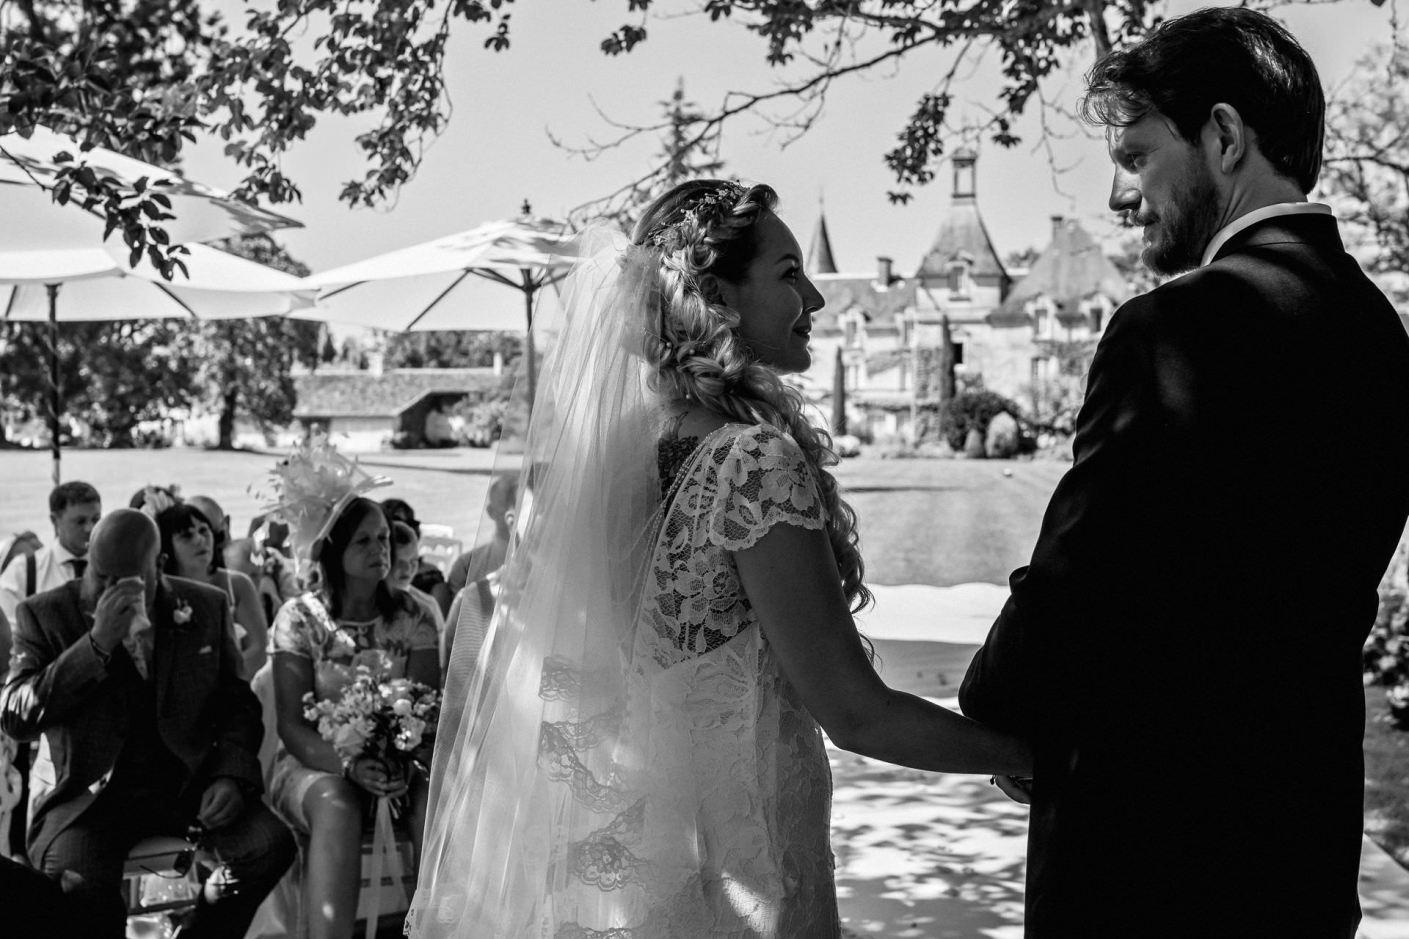 photography fro the wedding at Chateau Le Mas de Montet